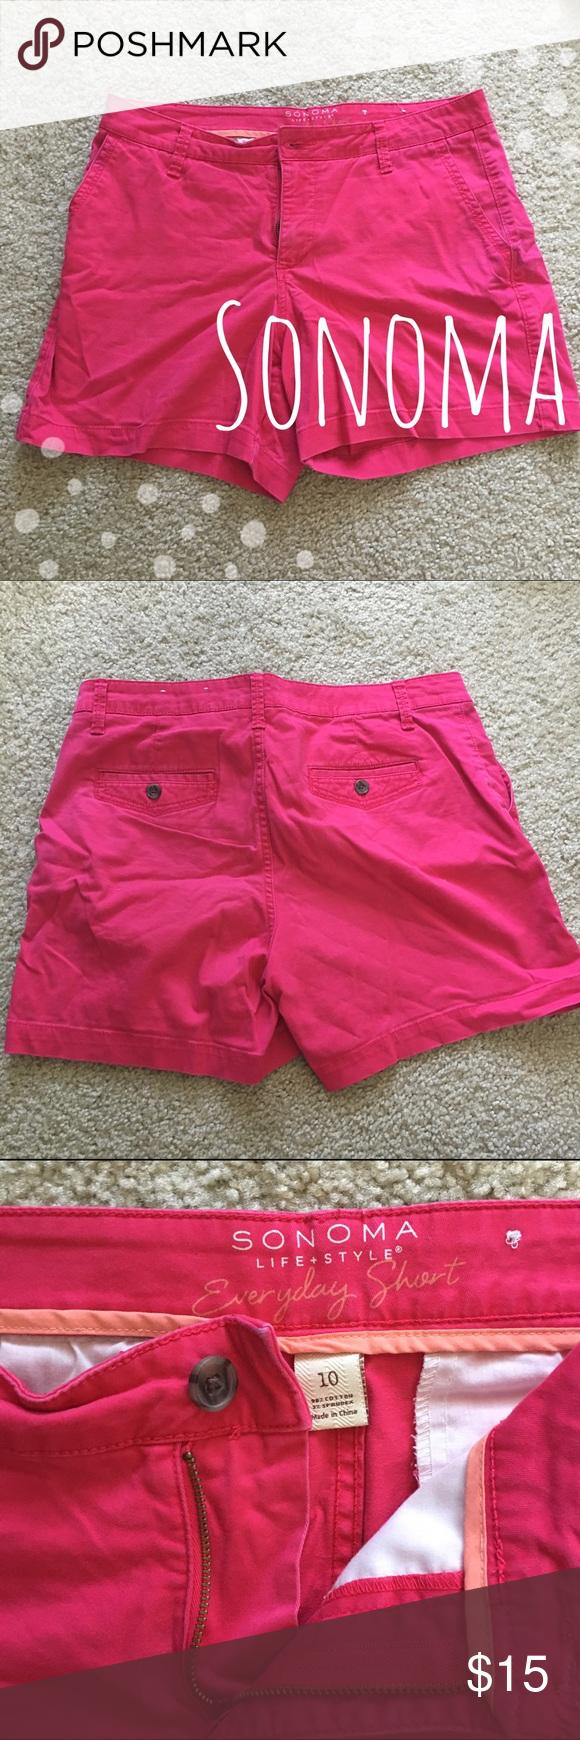 ⚡️flash sale ⚡️Pink Sonoma Life + Style Shorts Bright pink summer fun shorts ▪️98% Cotton ▪️2% Spandex  ▪️ Worn 2x    🚭 Smoke-free home 📬 Ships by next day 💲 Price negotiable   💕 Happy Poshing! 🎉 Sonoma Shorts